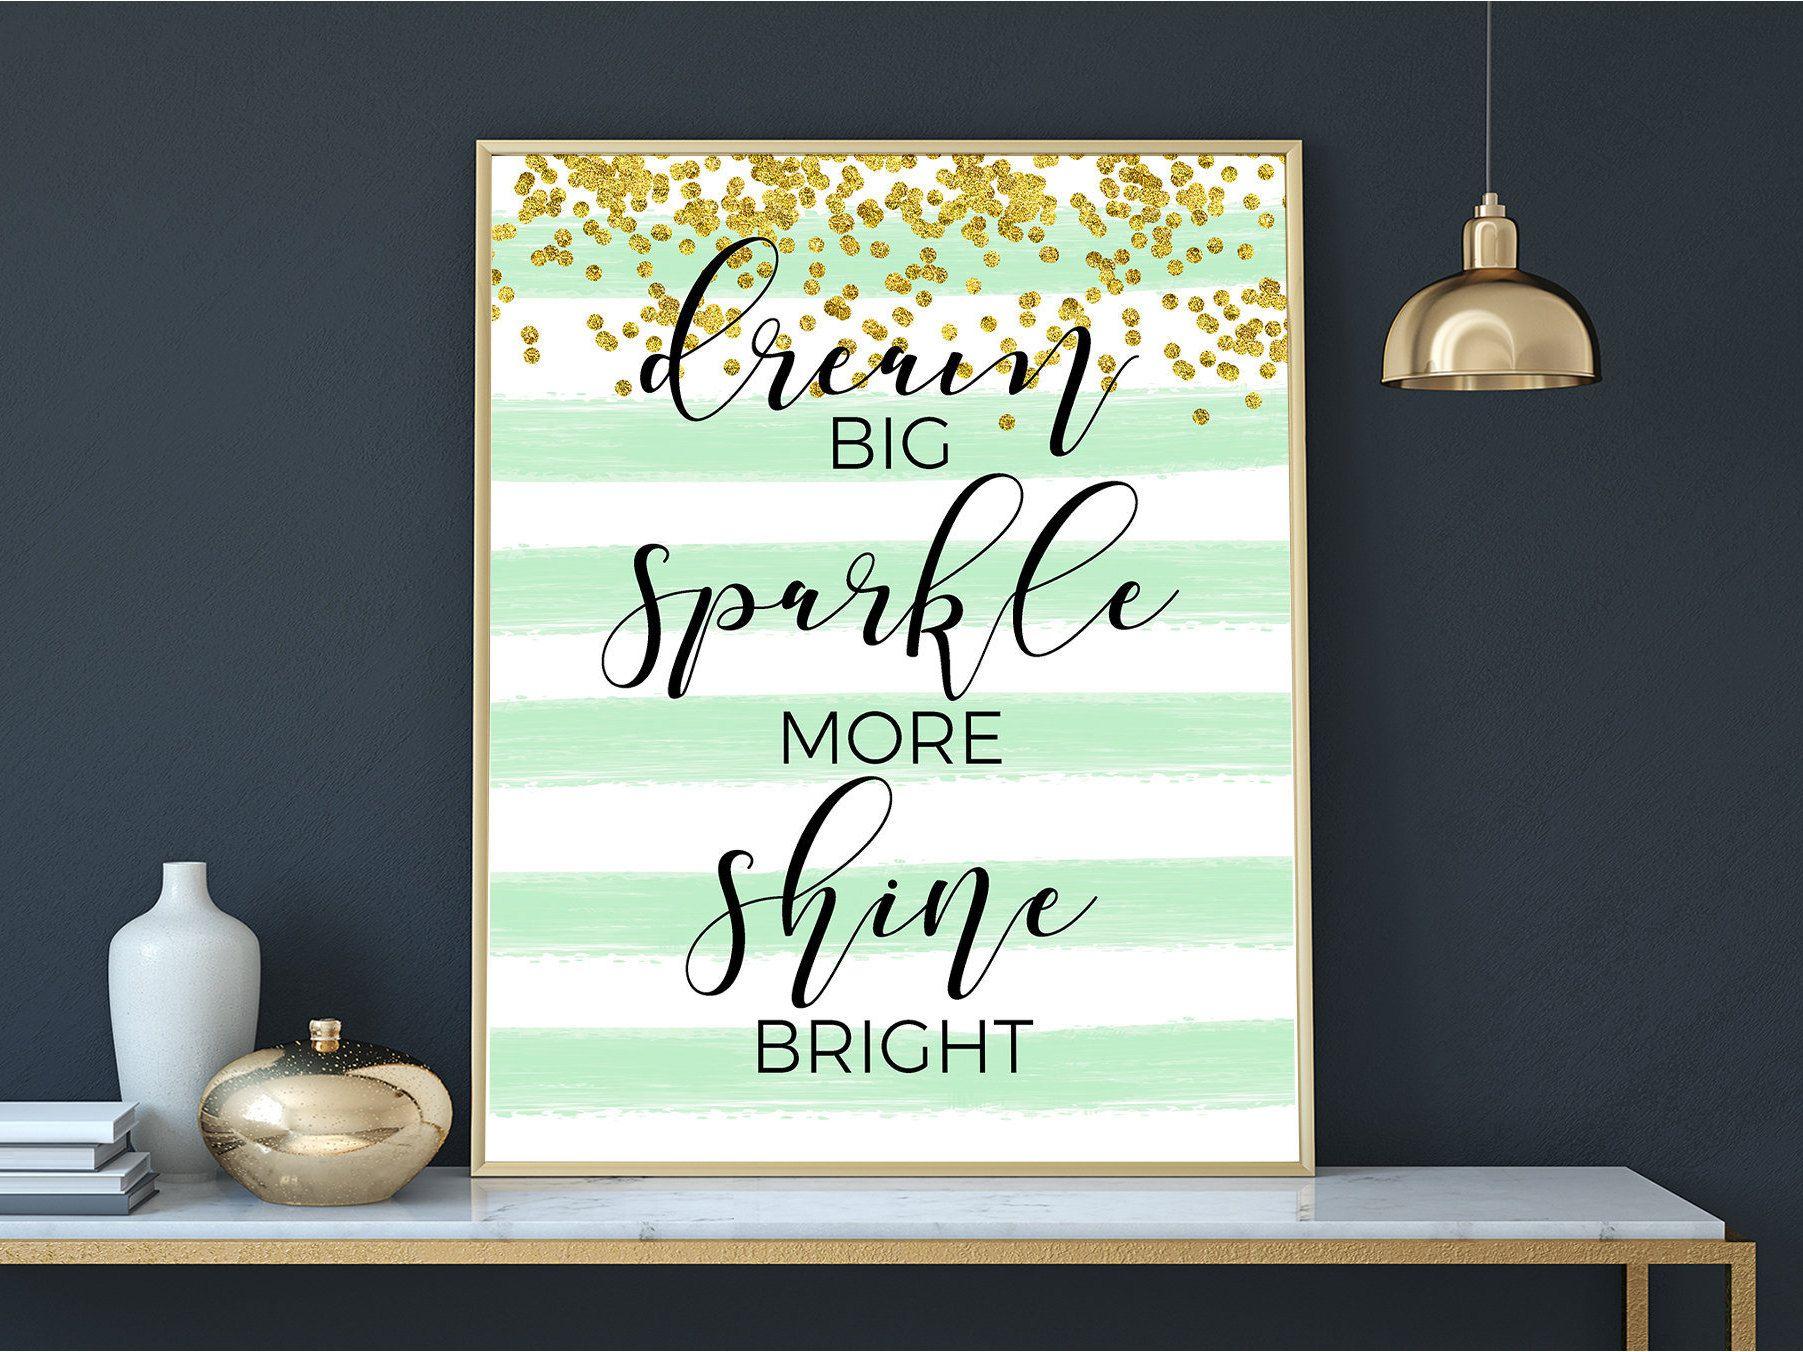 Mint green nursery print dream big sparkle more shine bright girls